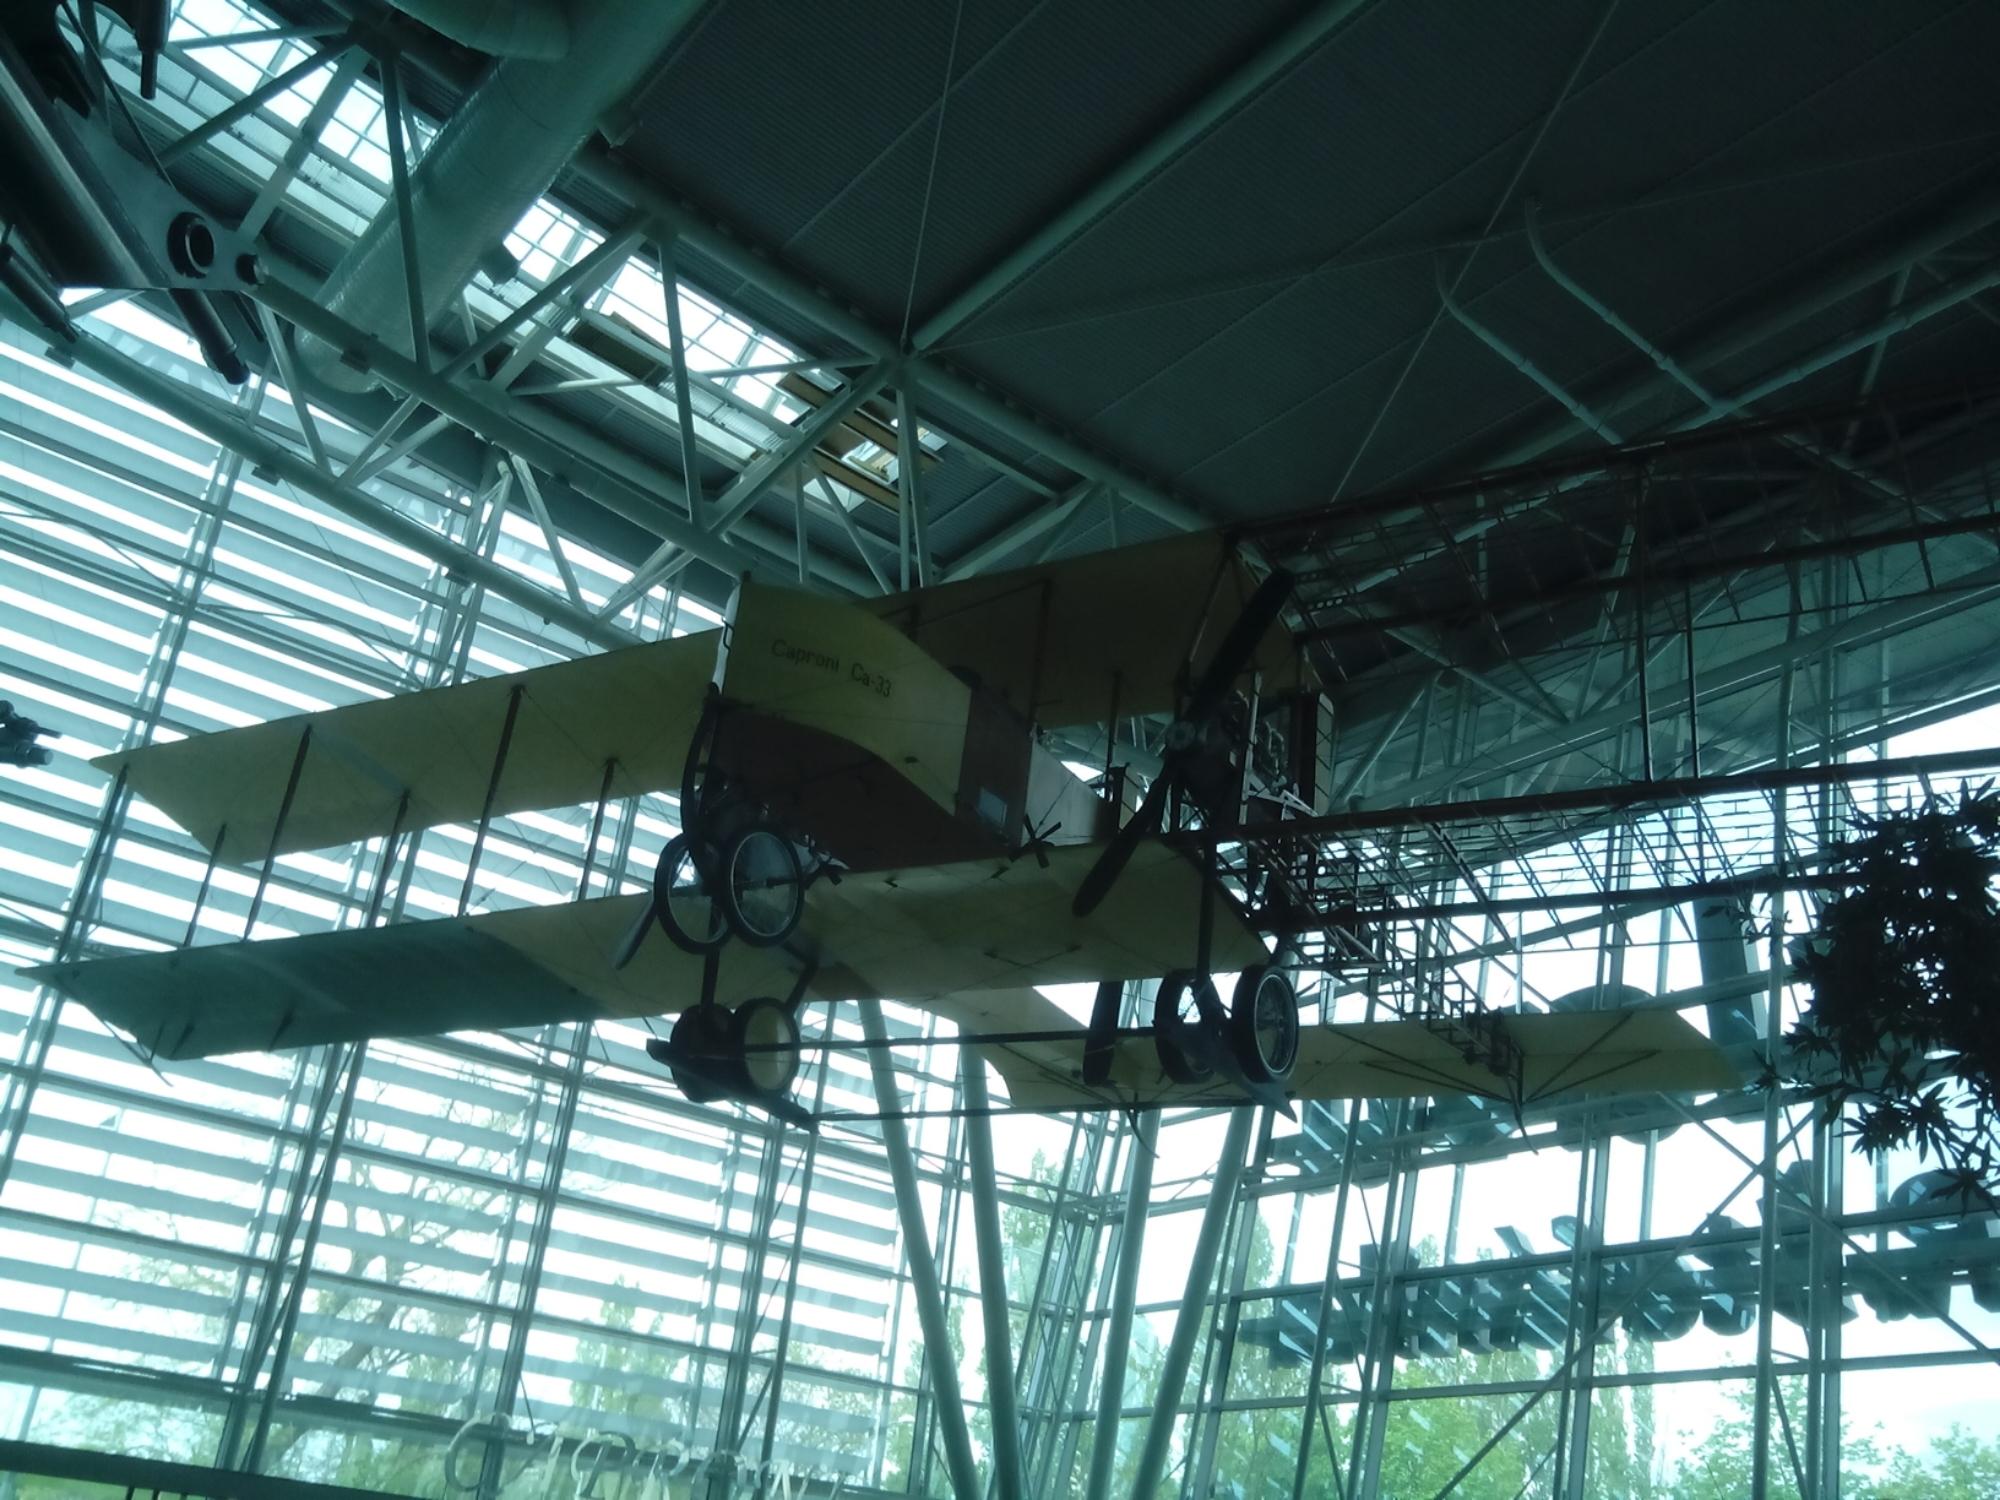 Avión antiguo - Letisko - Aeropuerto de Bratislava